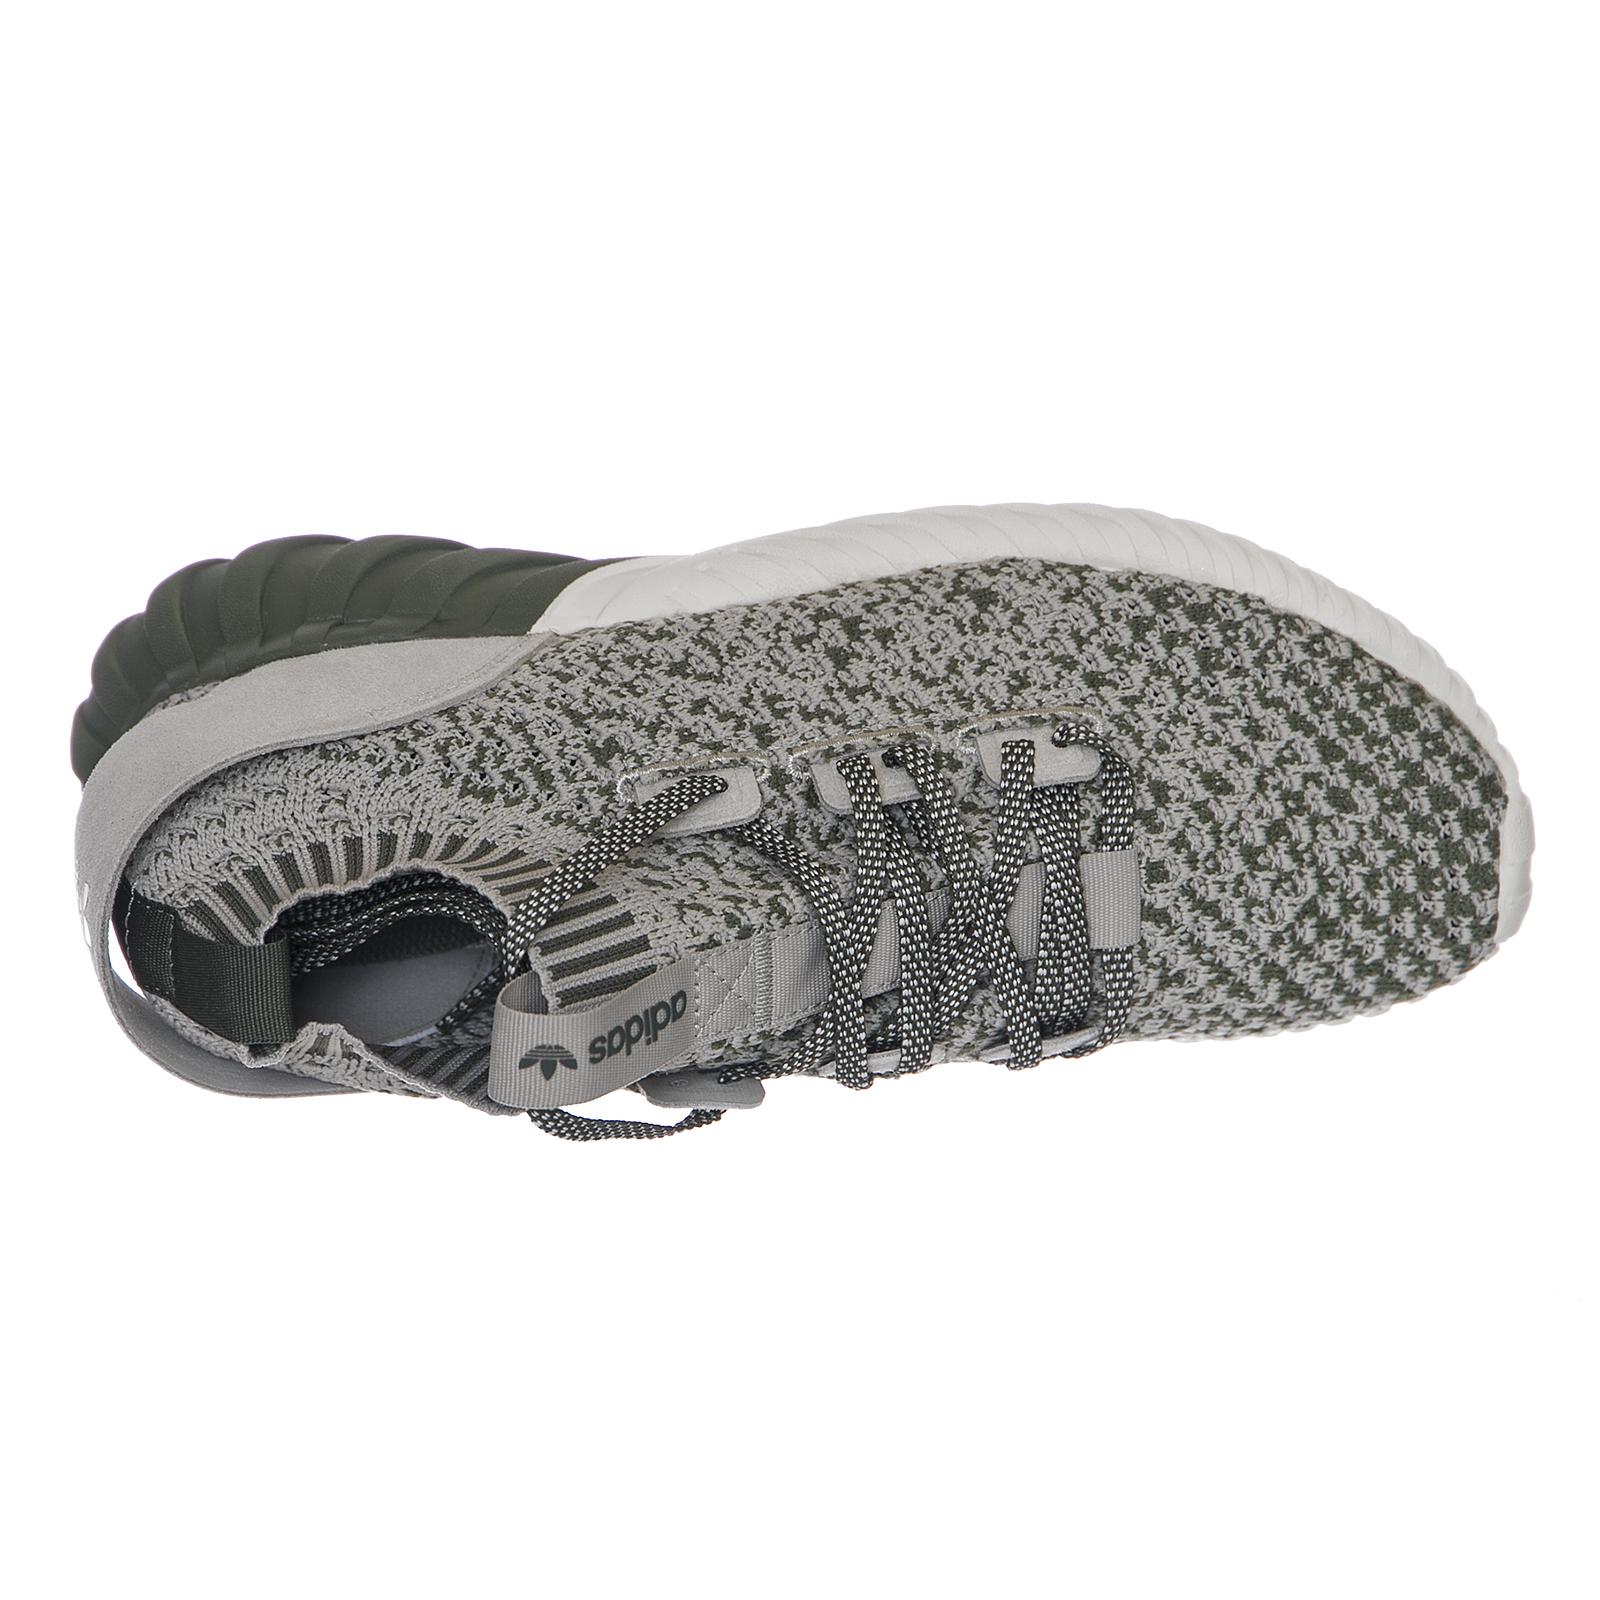 Adidas tubulare doom sock p basgrn / sesamo bianco, verde, verde, bianco, verde / c d04719